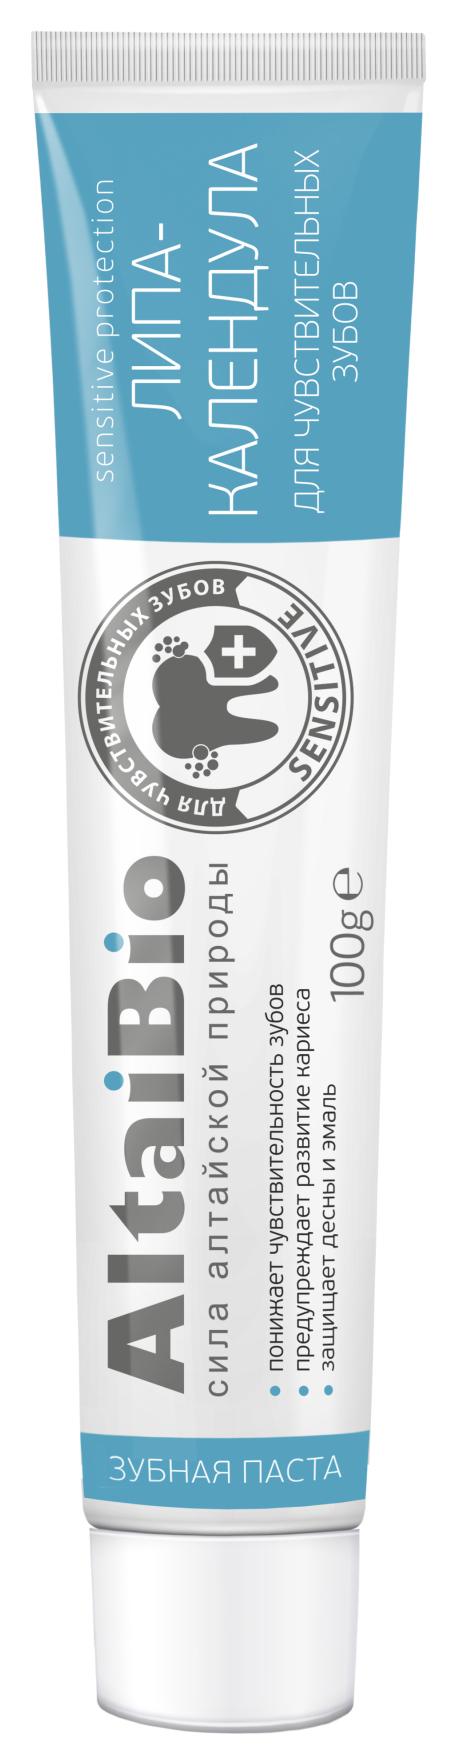 Зубная паста AltaiBio Липа-Календула 100 г